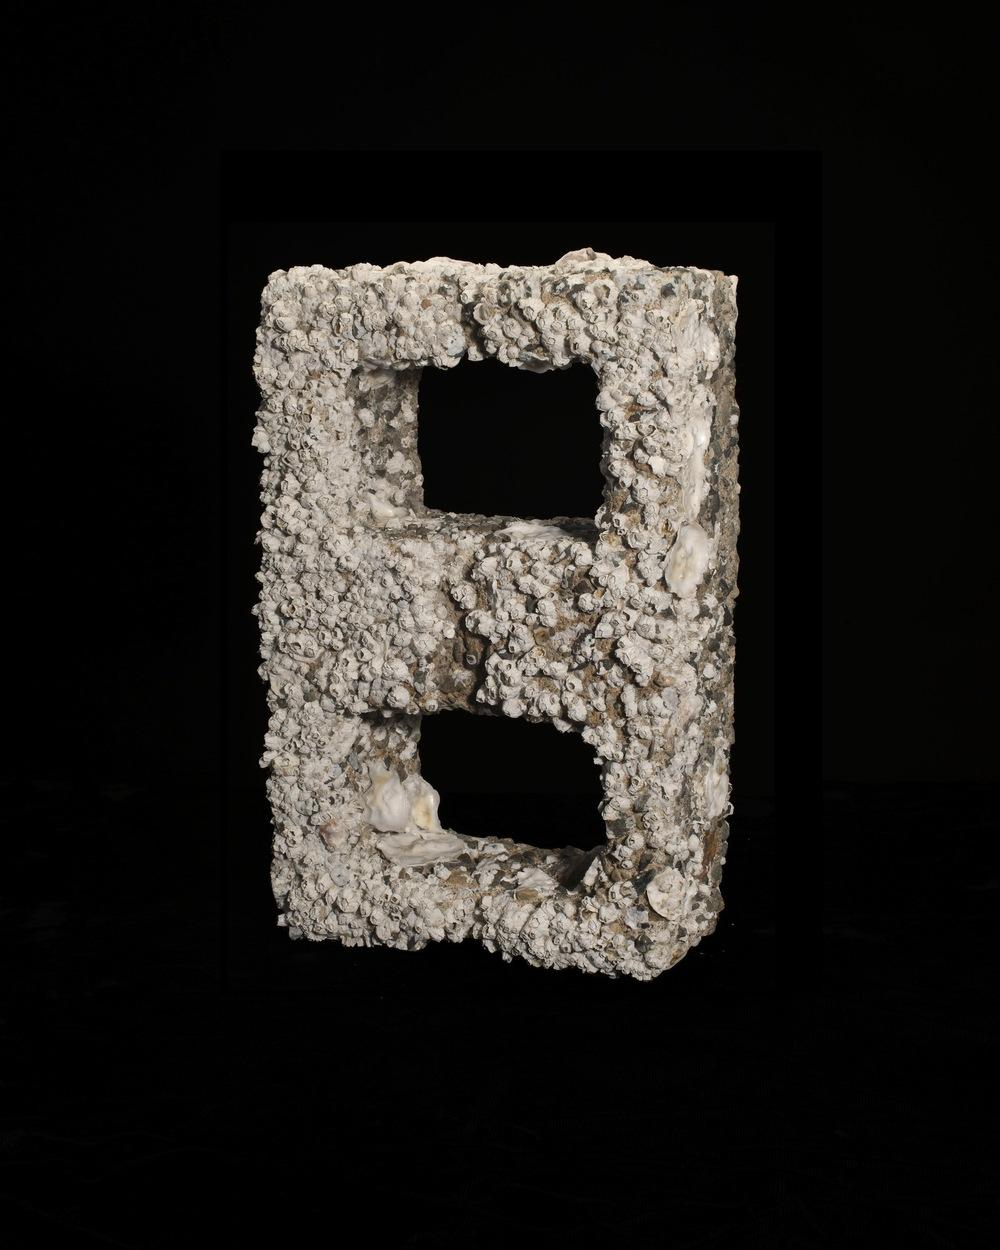 Barnacled Cinder Block